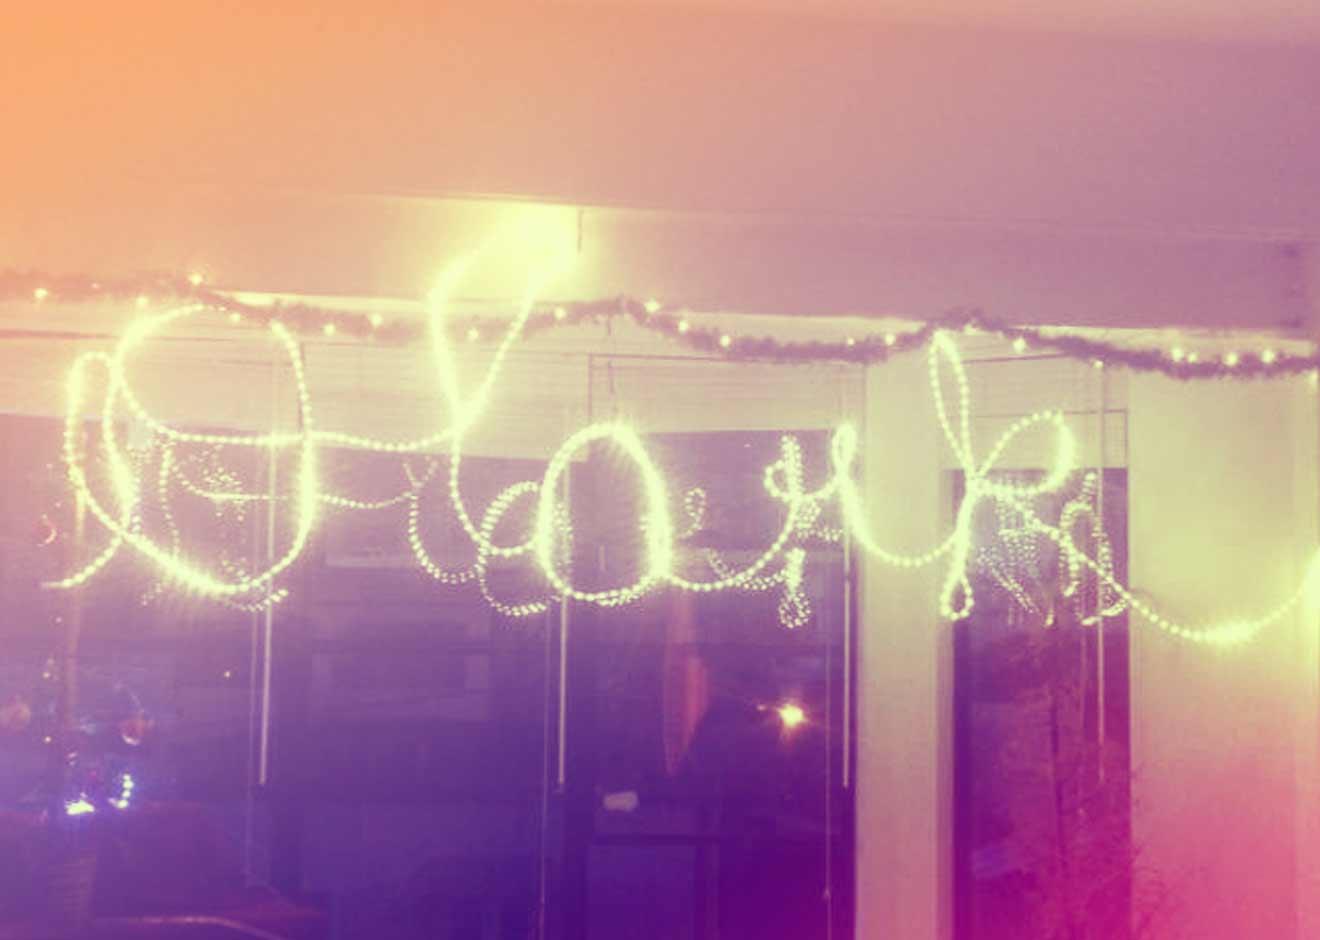 Olark written in lights